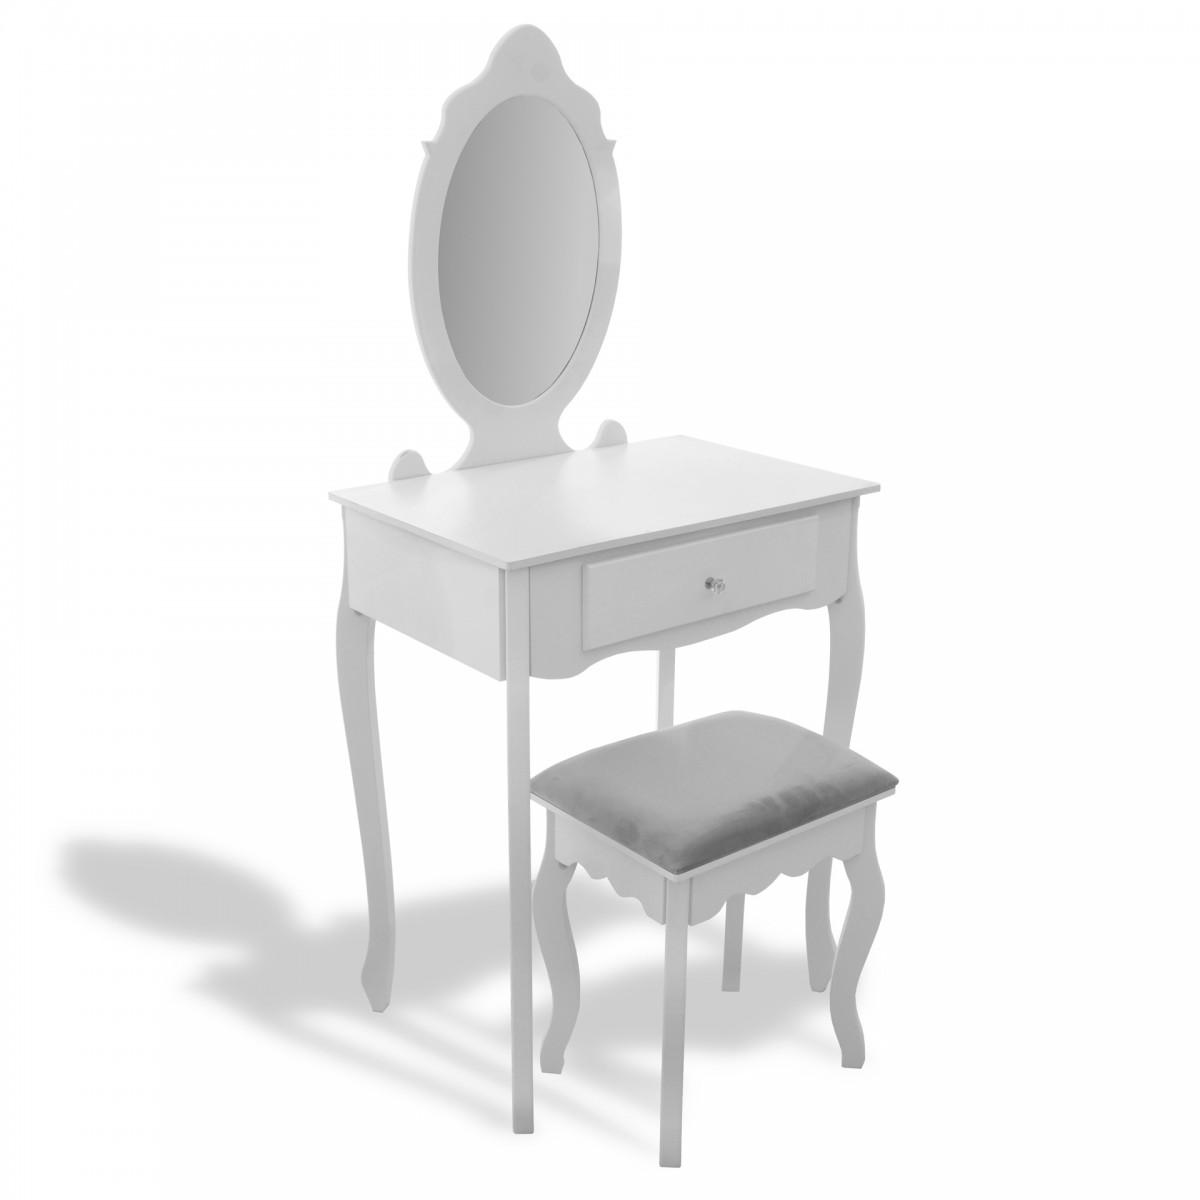 Tutumi Toaletní kosmetický stolek se zrcadlem a taburetem 17070 bílý